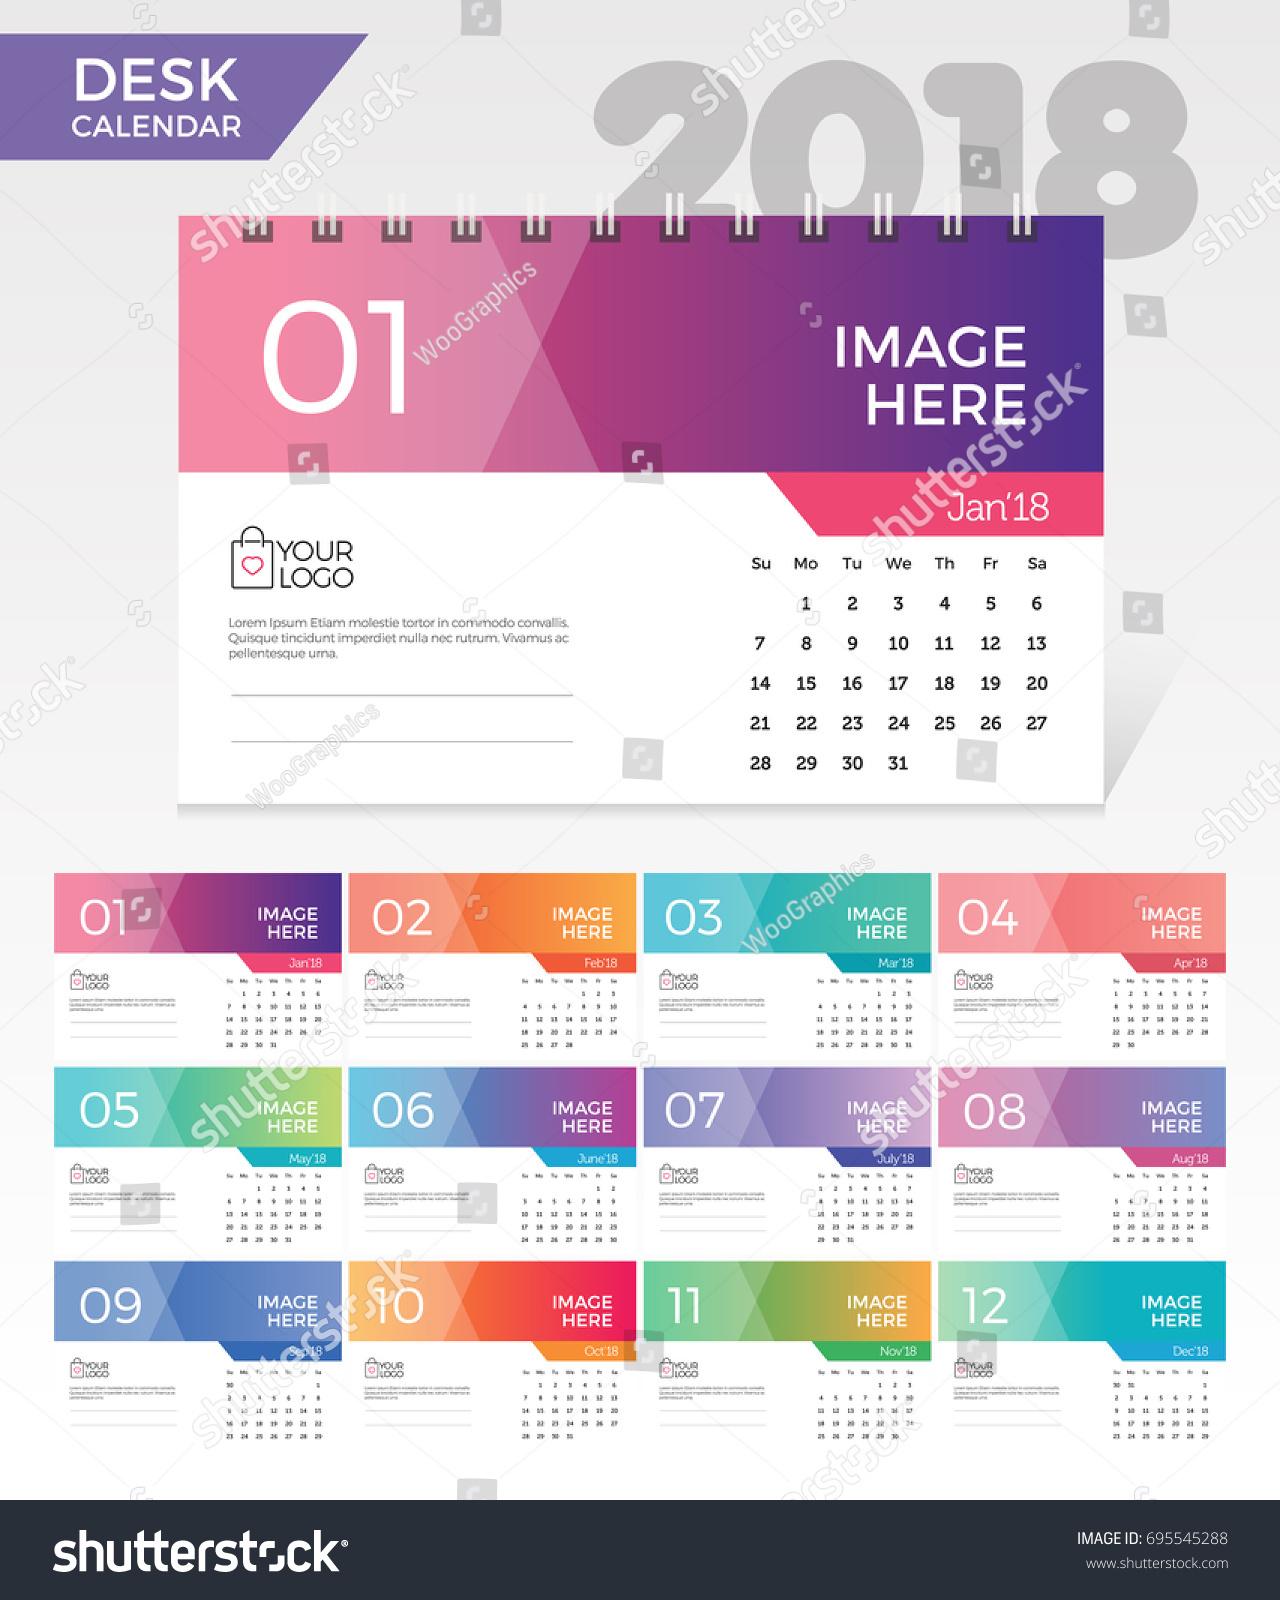 Elegant Desk Calendar Design : Desk calendar simple colorful gradient stock vector